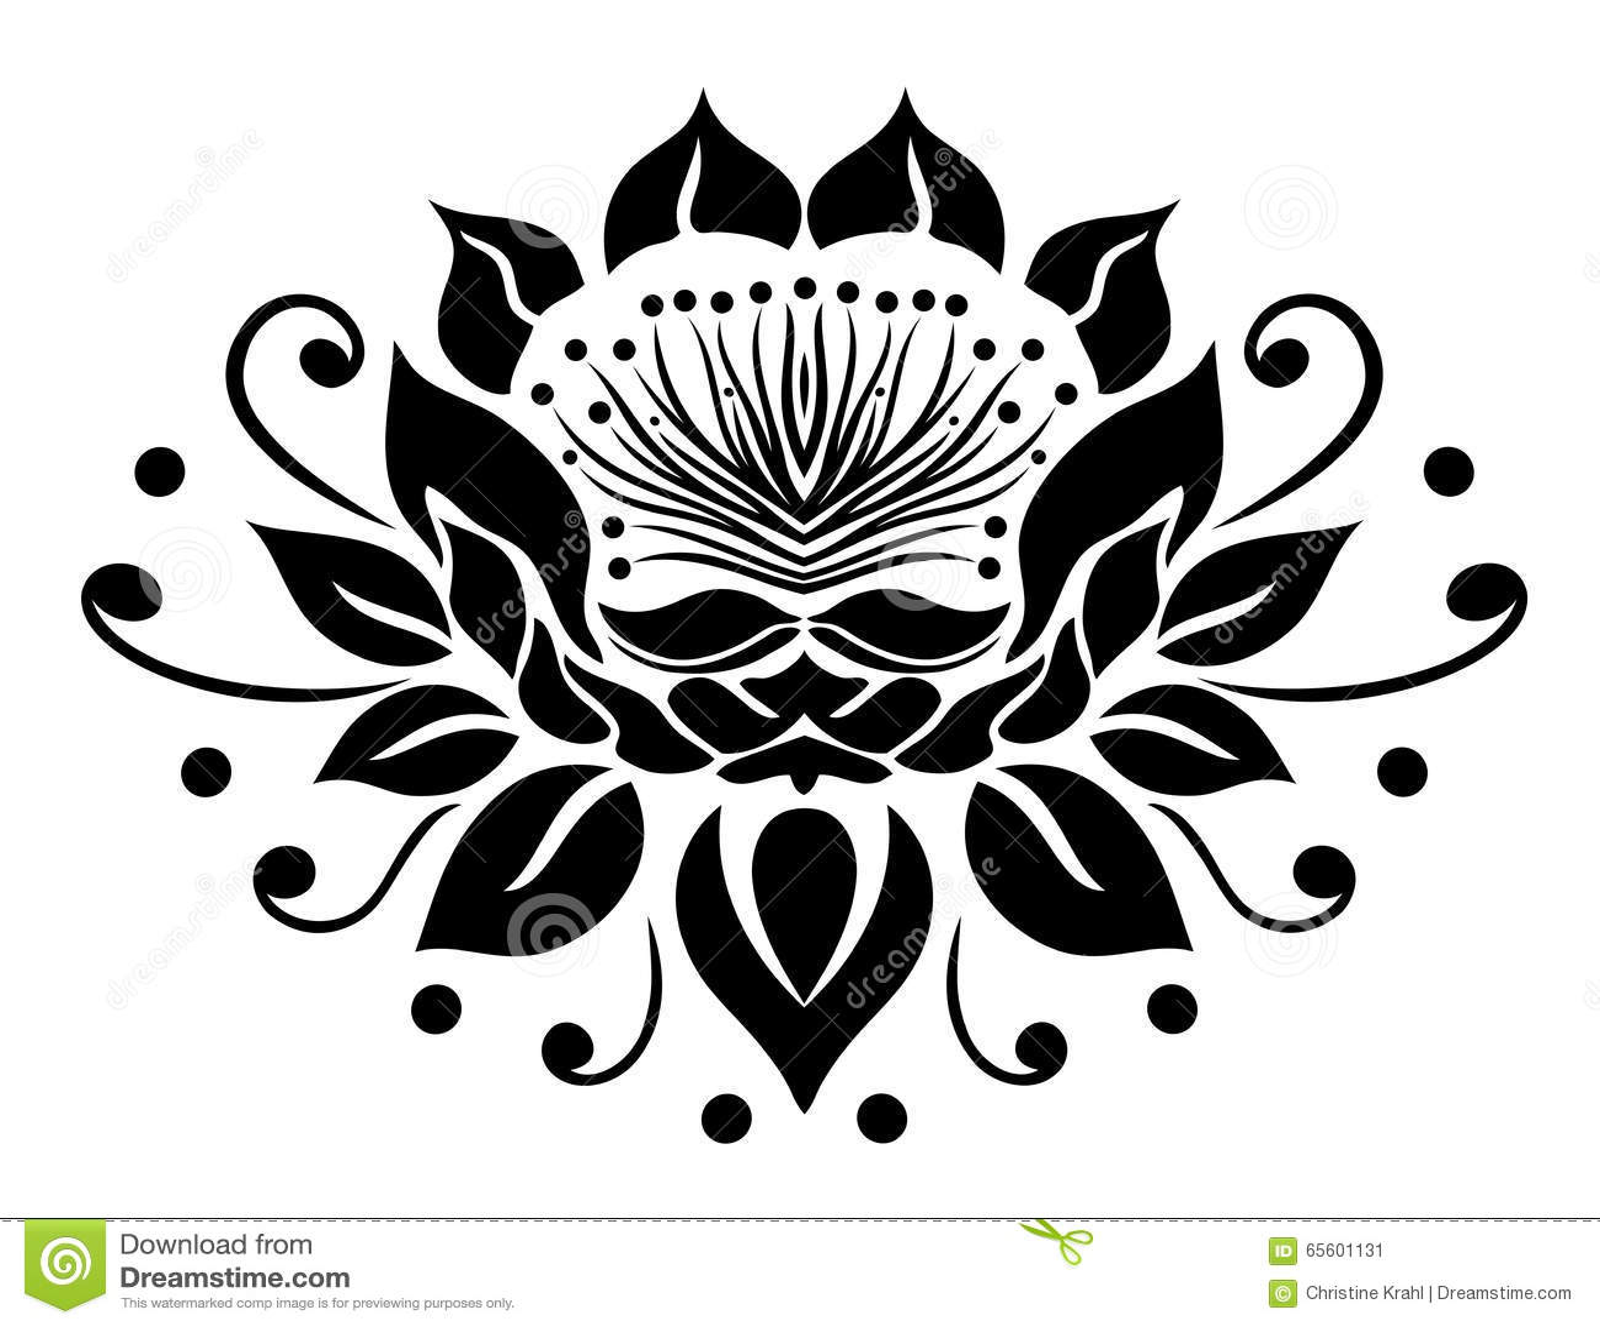 Filigree lotus flower stock vector illustration of health 65601131 filigree lotus flower mightylinksfo